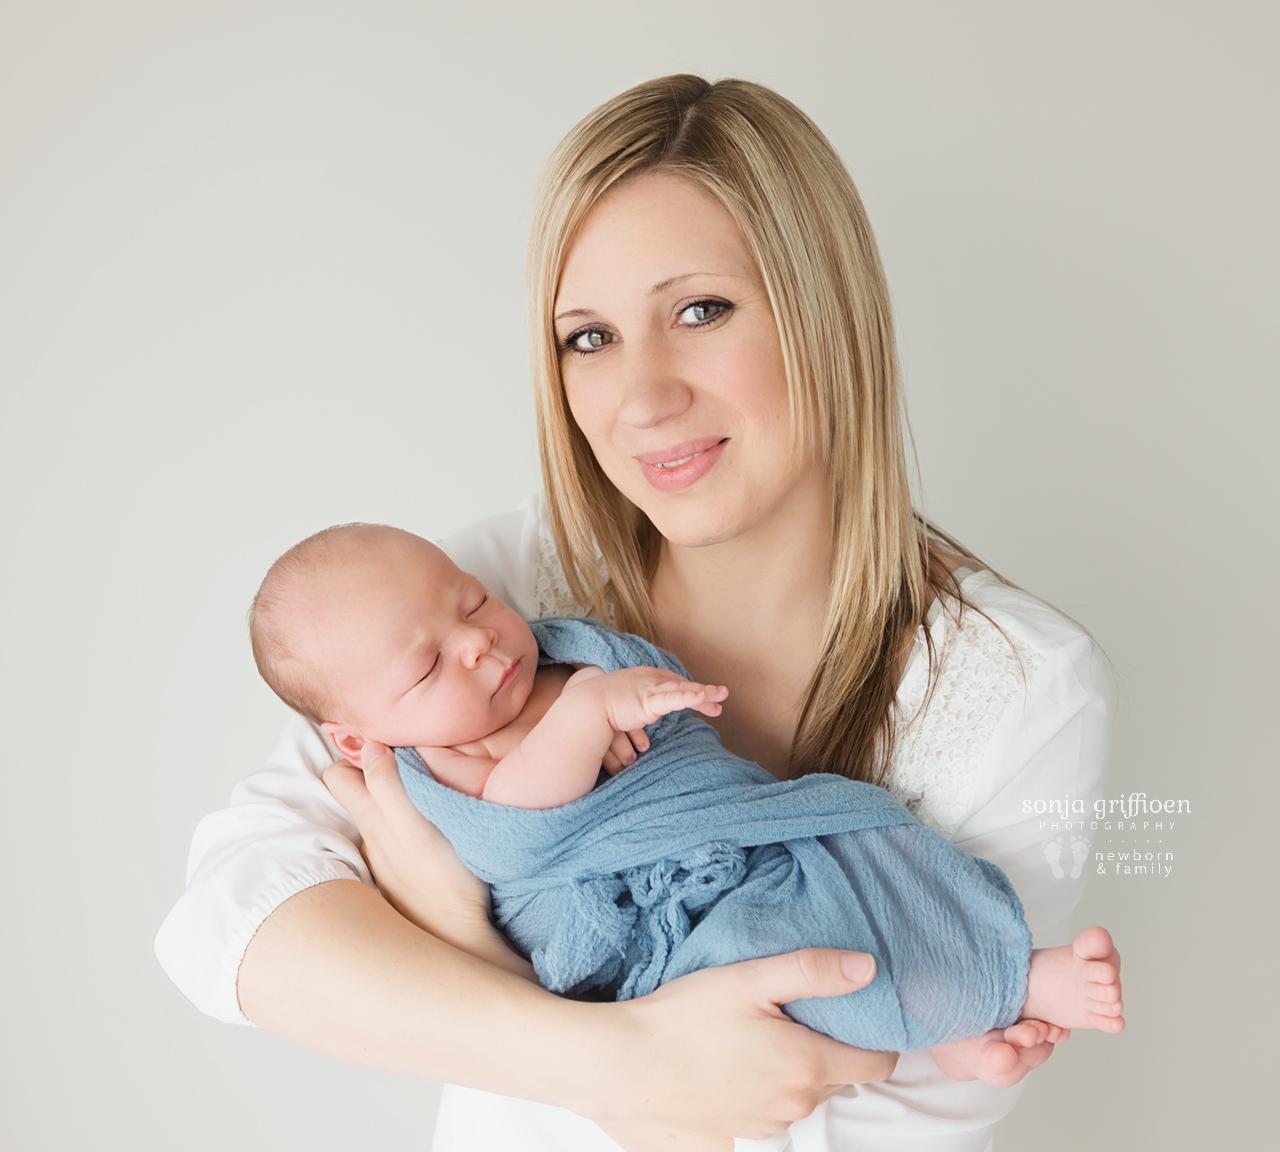 Joshua-Newborn-Brisbane-Newborn-Photographer-Sonja-Griffioen-16.jpg